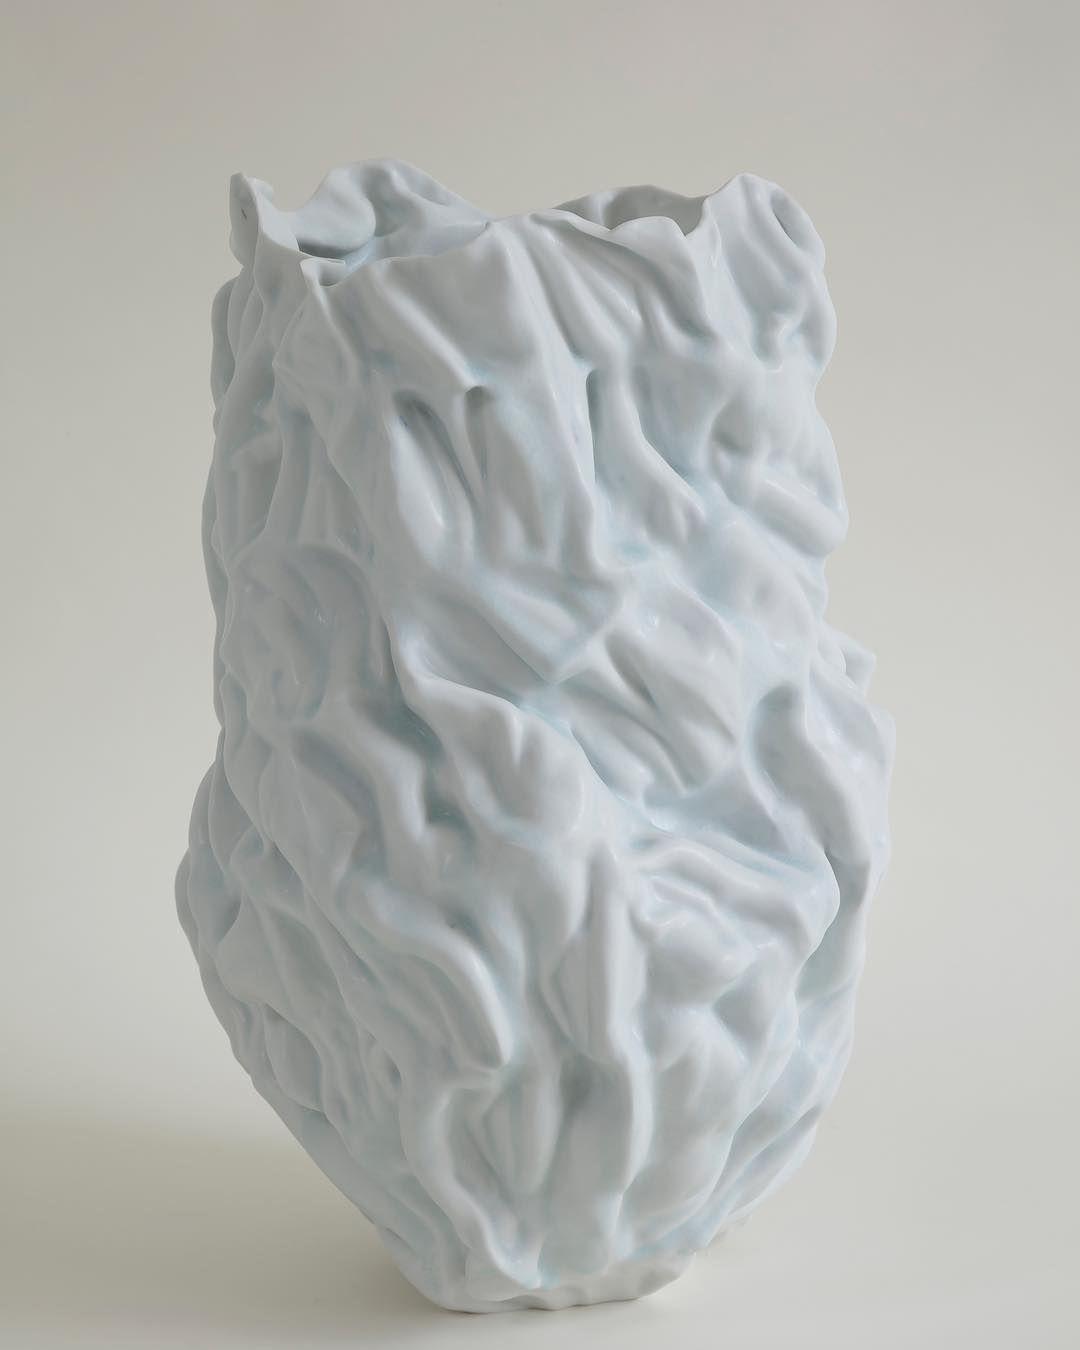 Pin By Nancy Murphy On Ceramics In 2020 Ceramic Art Ceramic